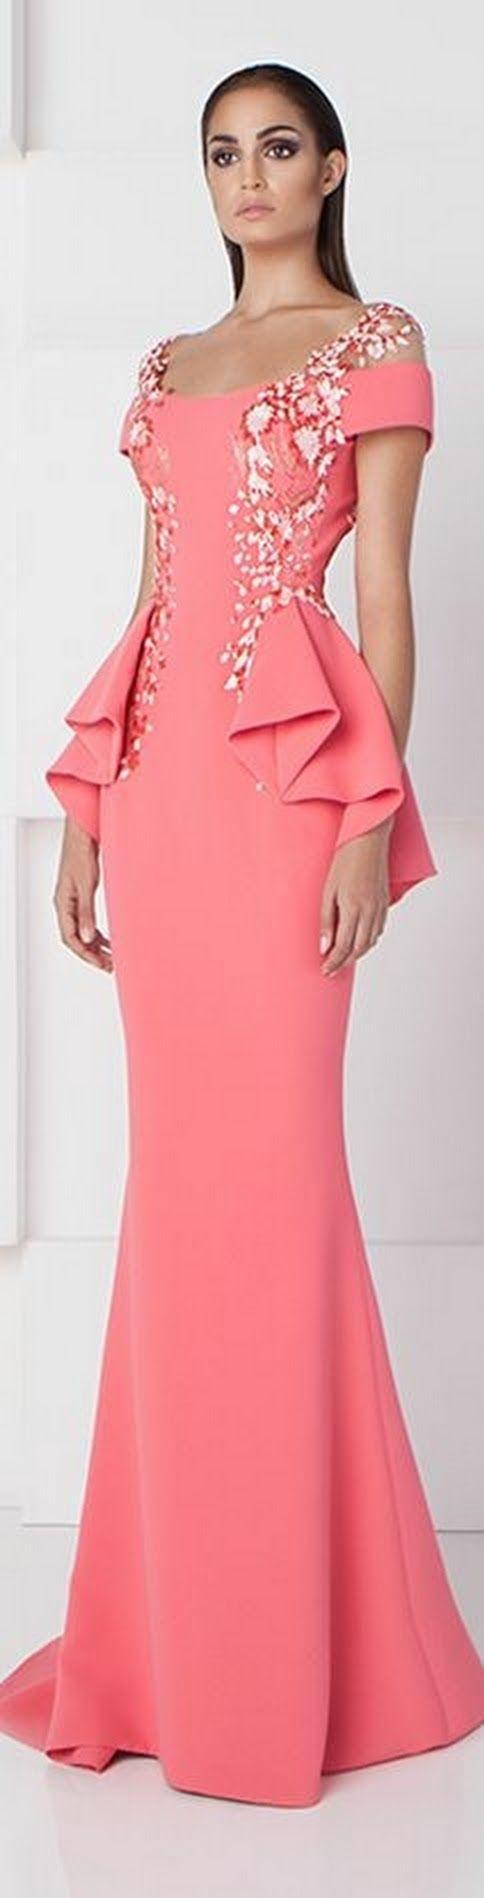 Vistoso Vestidos De Dama Feas Para Comprar Adorno - Colección de ...